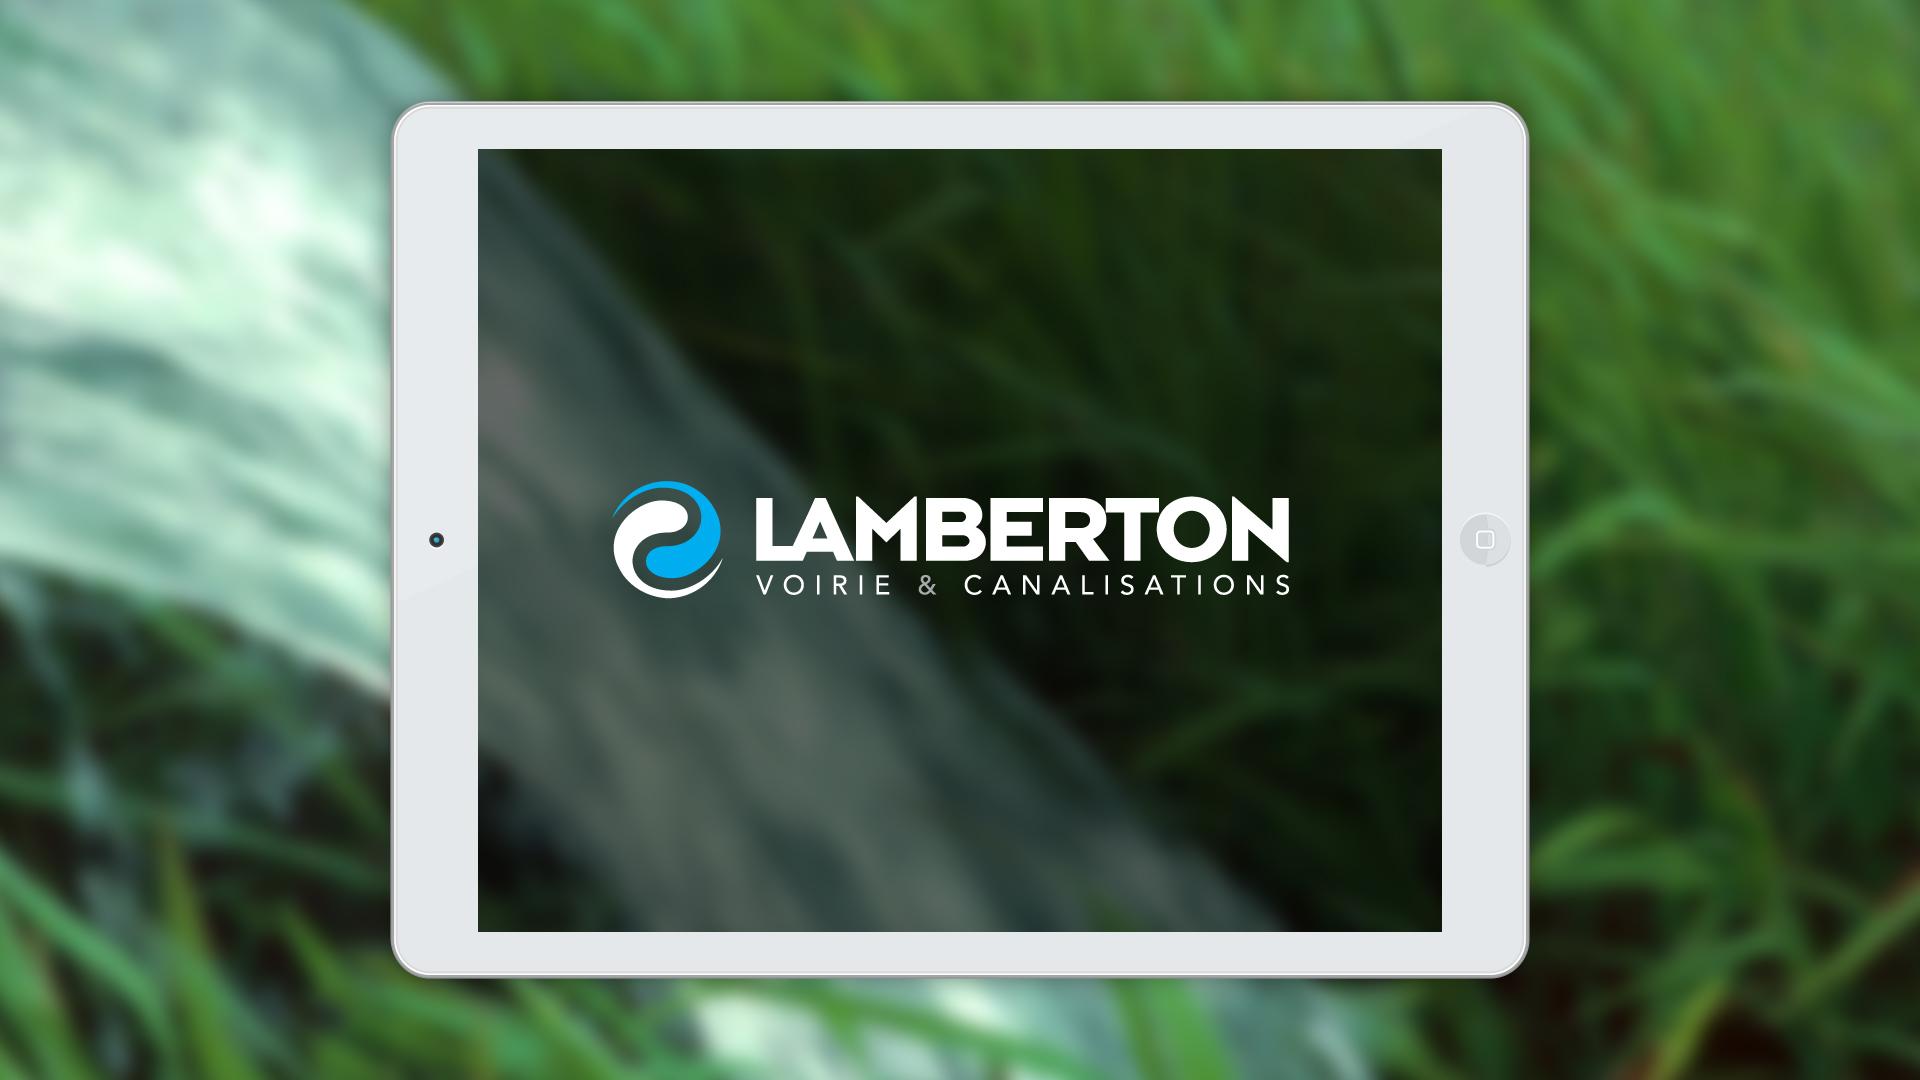 lamberton-apercu-logo-identite-logotype-creation-communication-caconcept-alexis-cretin-graphiste